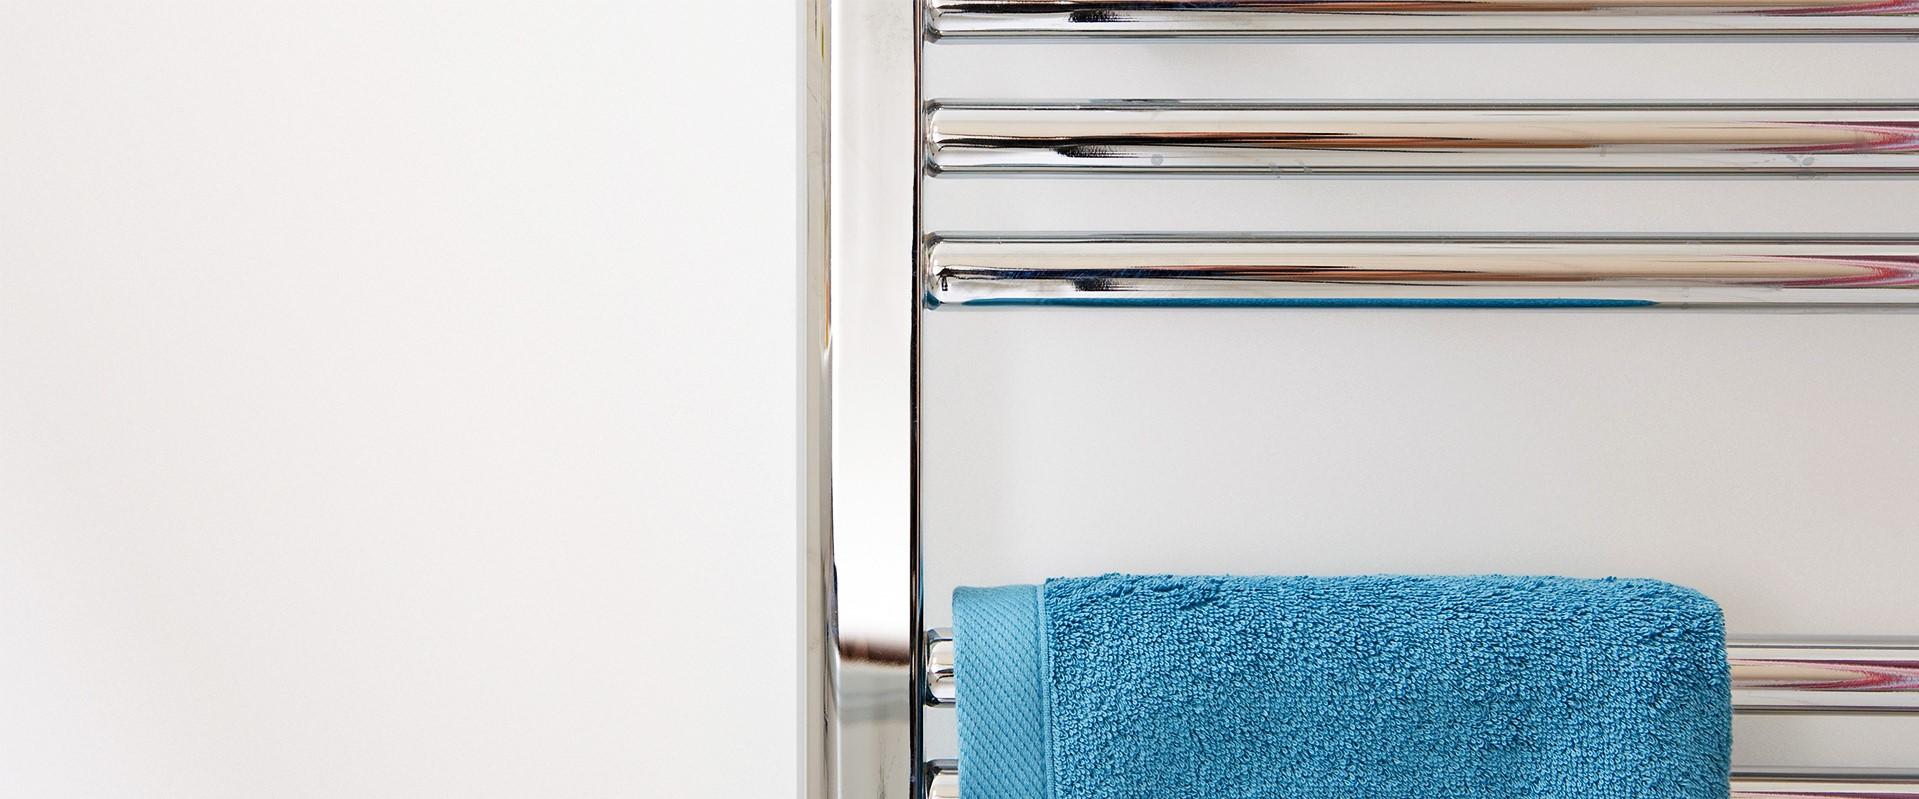 Installation d'un sèche-serviettes